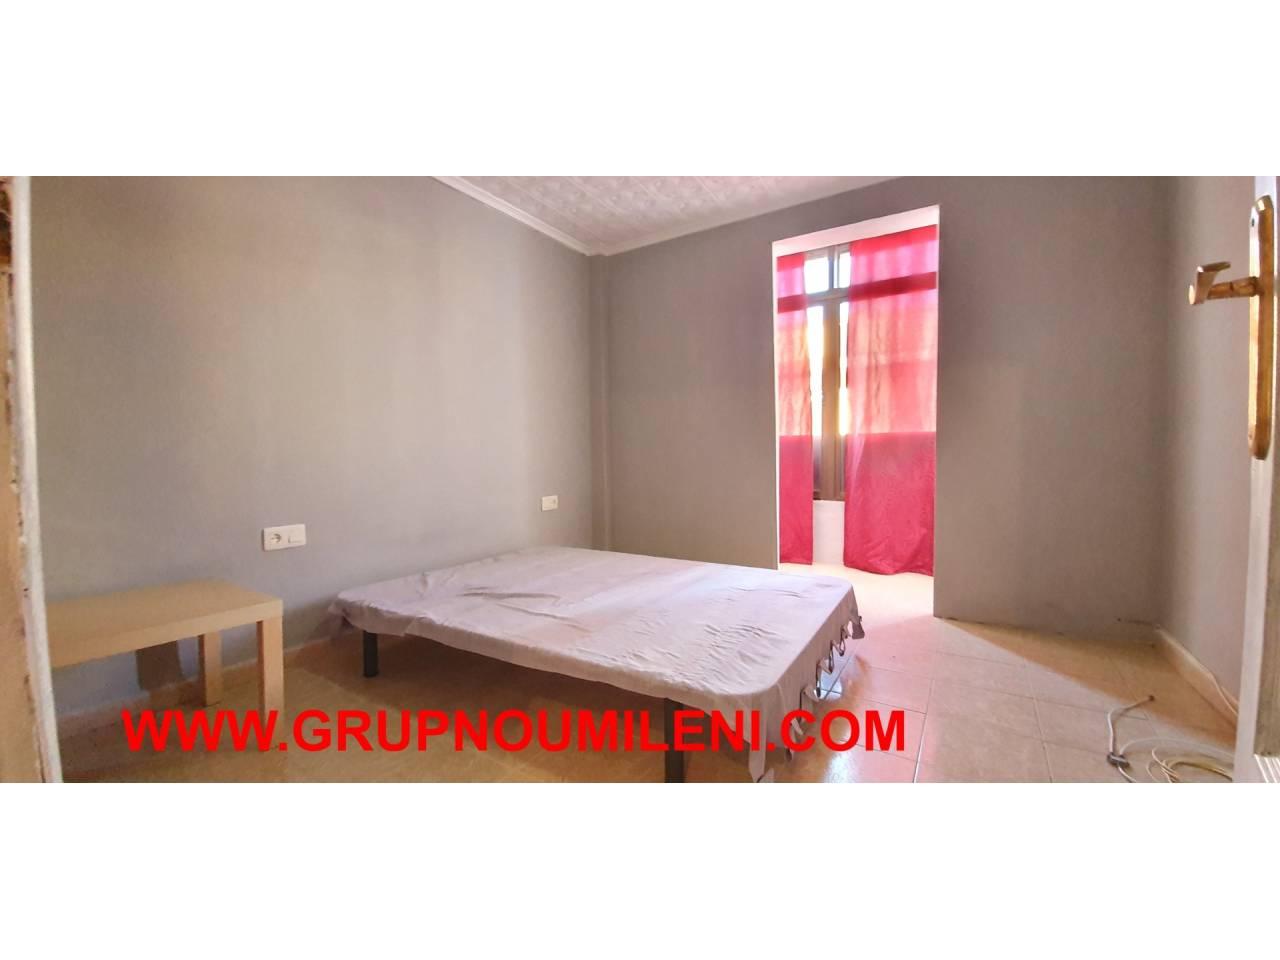 Affitto Appartamento  Region. Altura piso 4º, piso superficie total 70 m², superficie útil 70